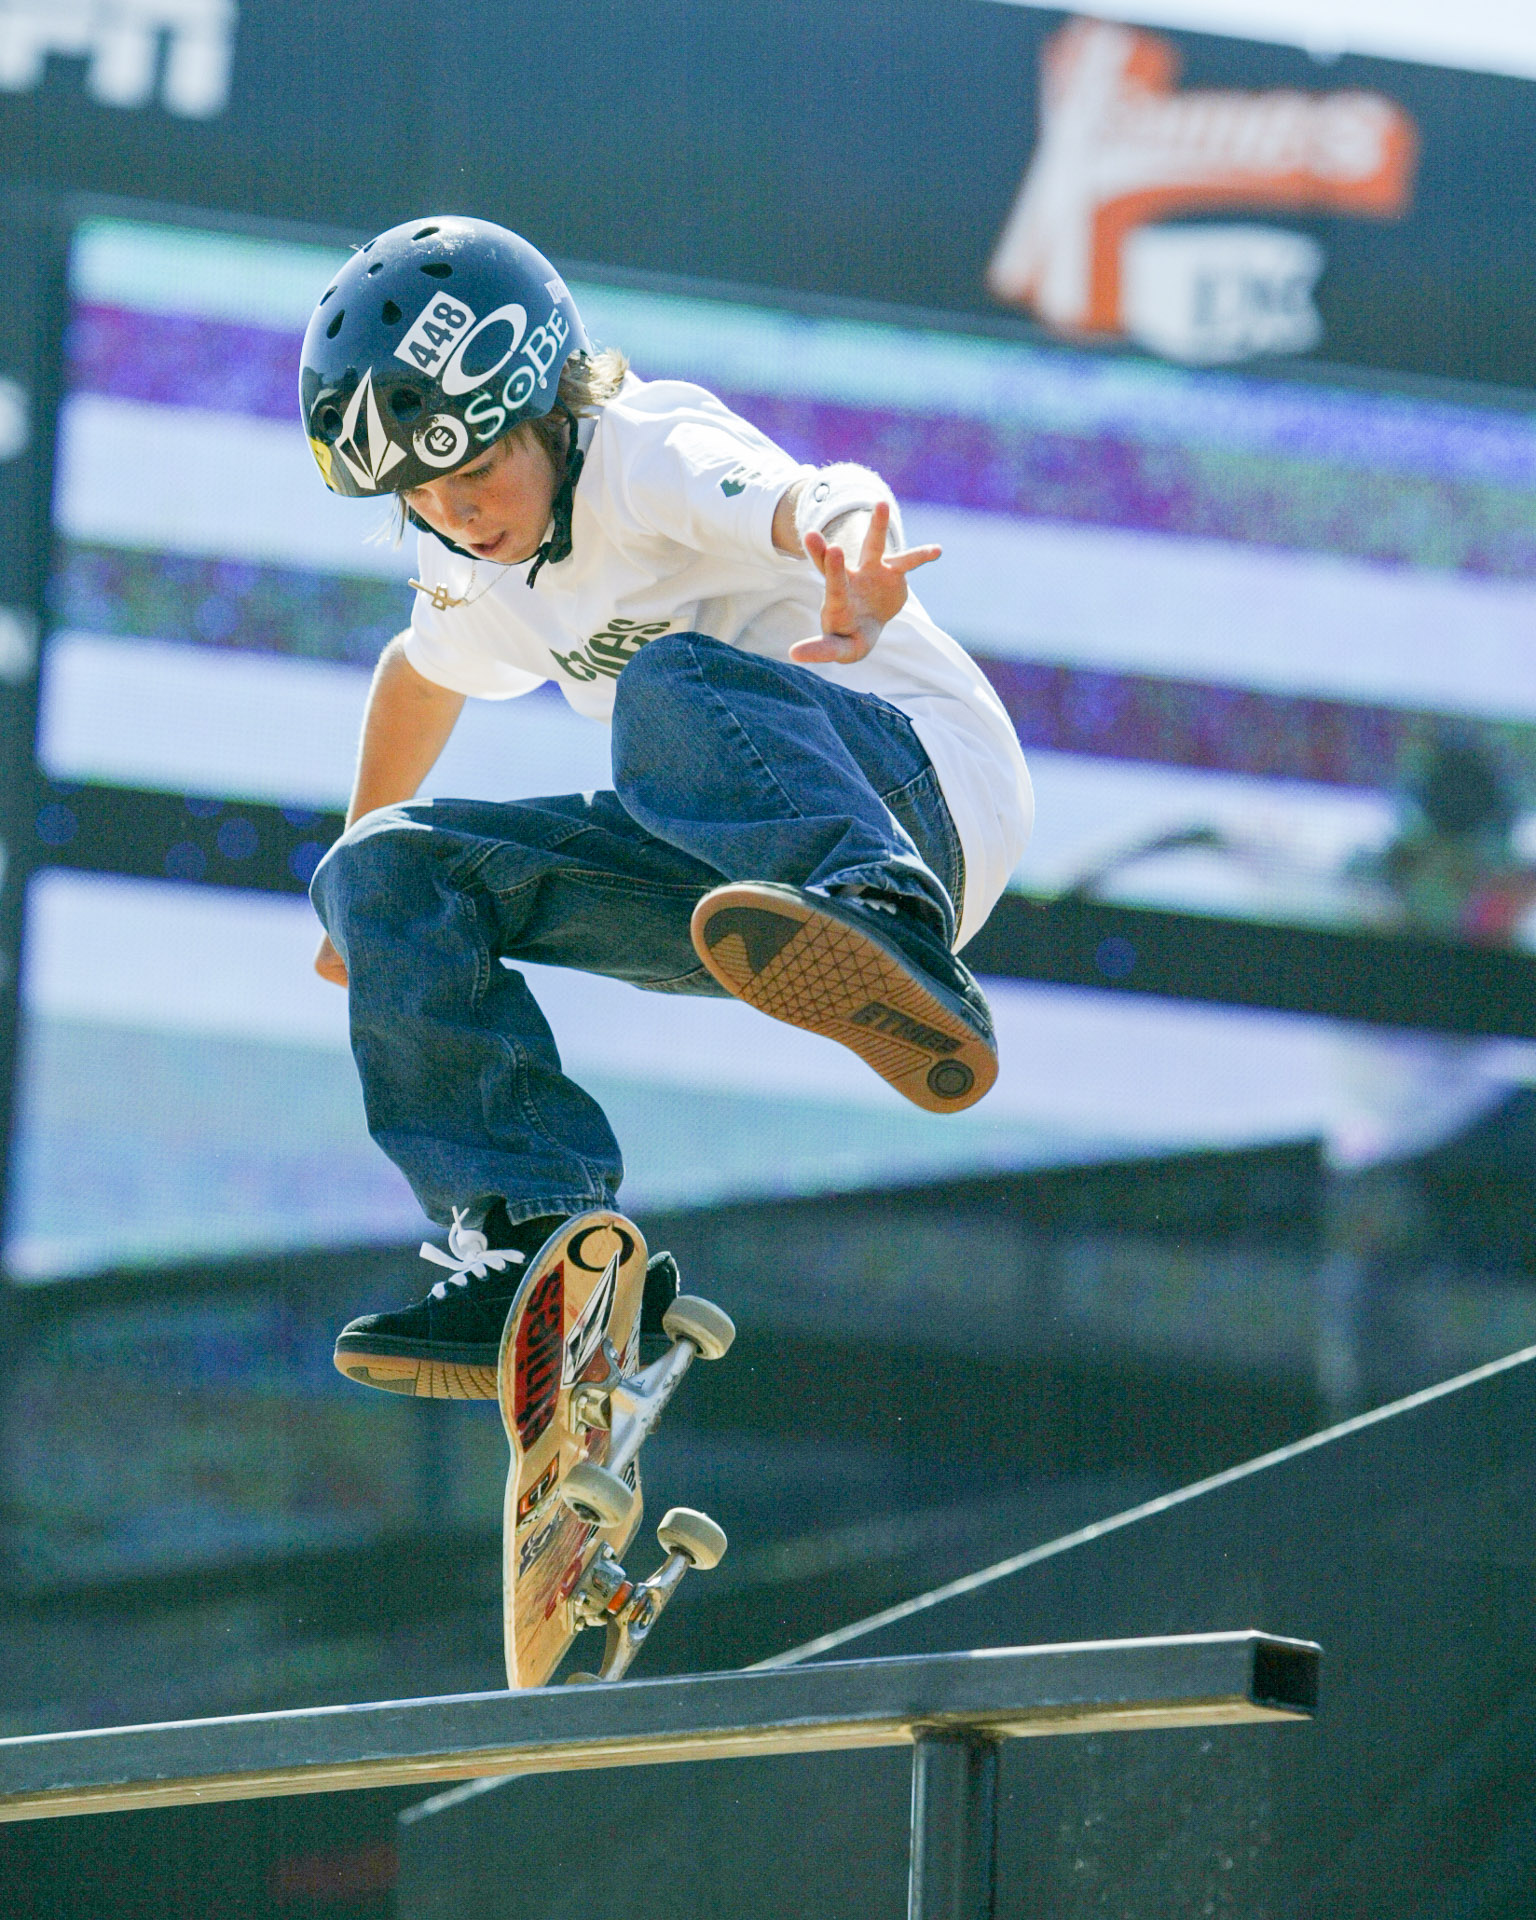 #20 Ryan Sheckler: Youngest Gold Medalist